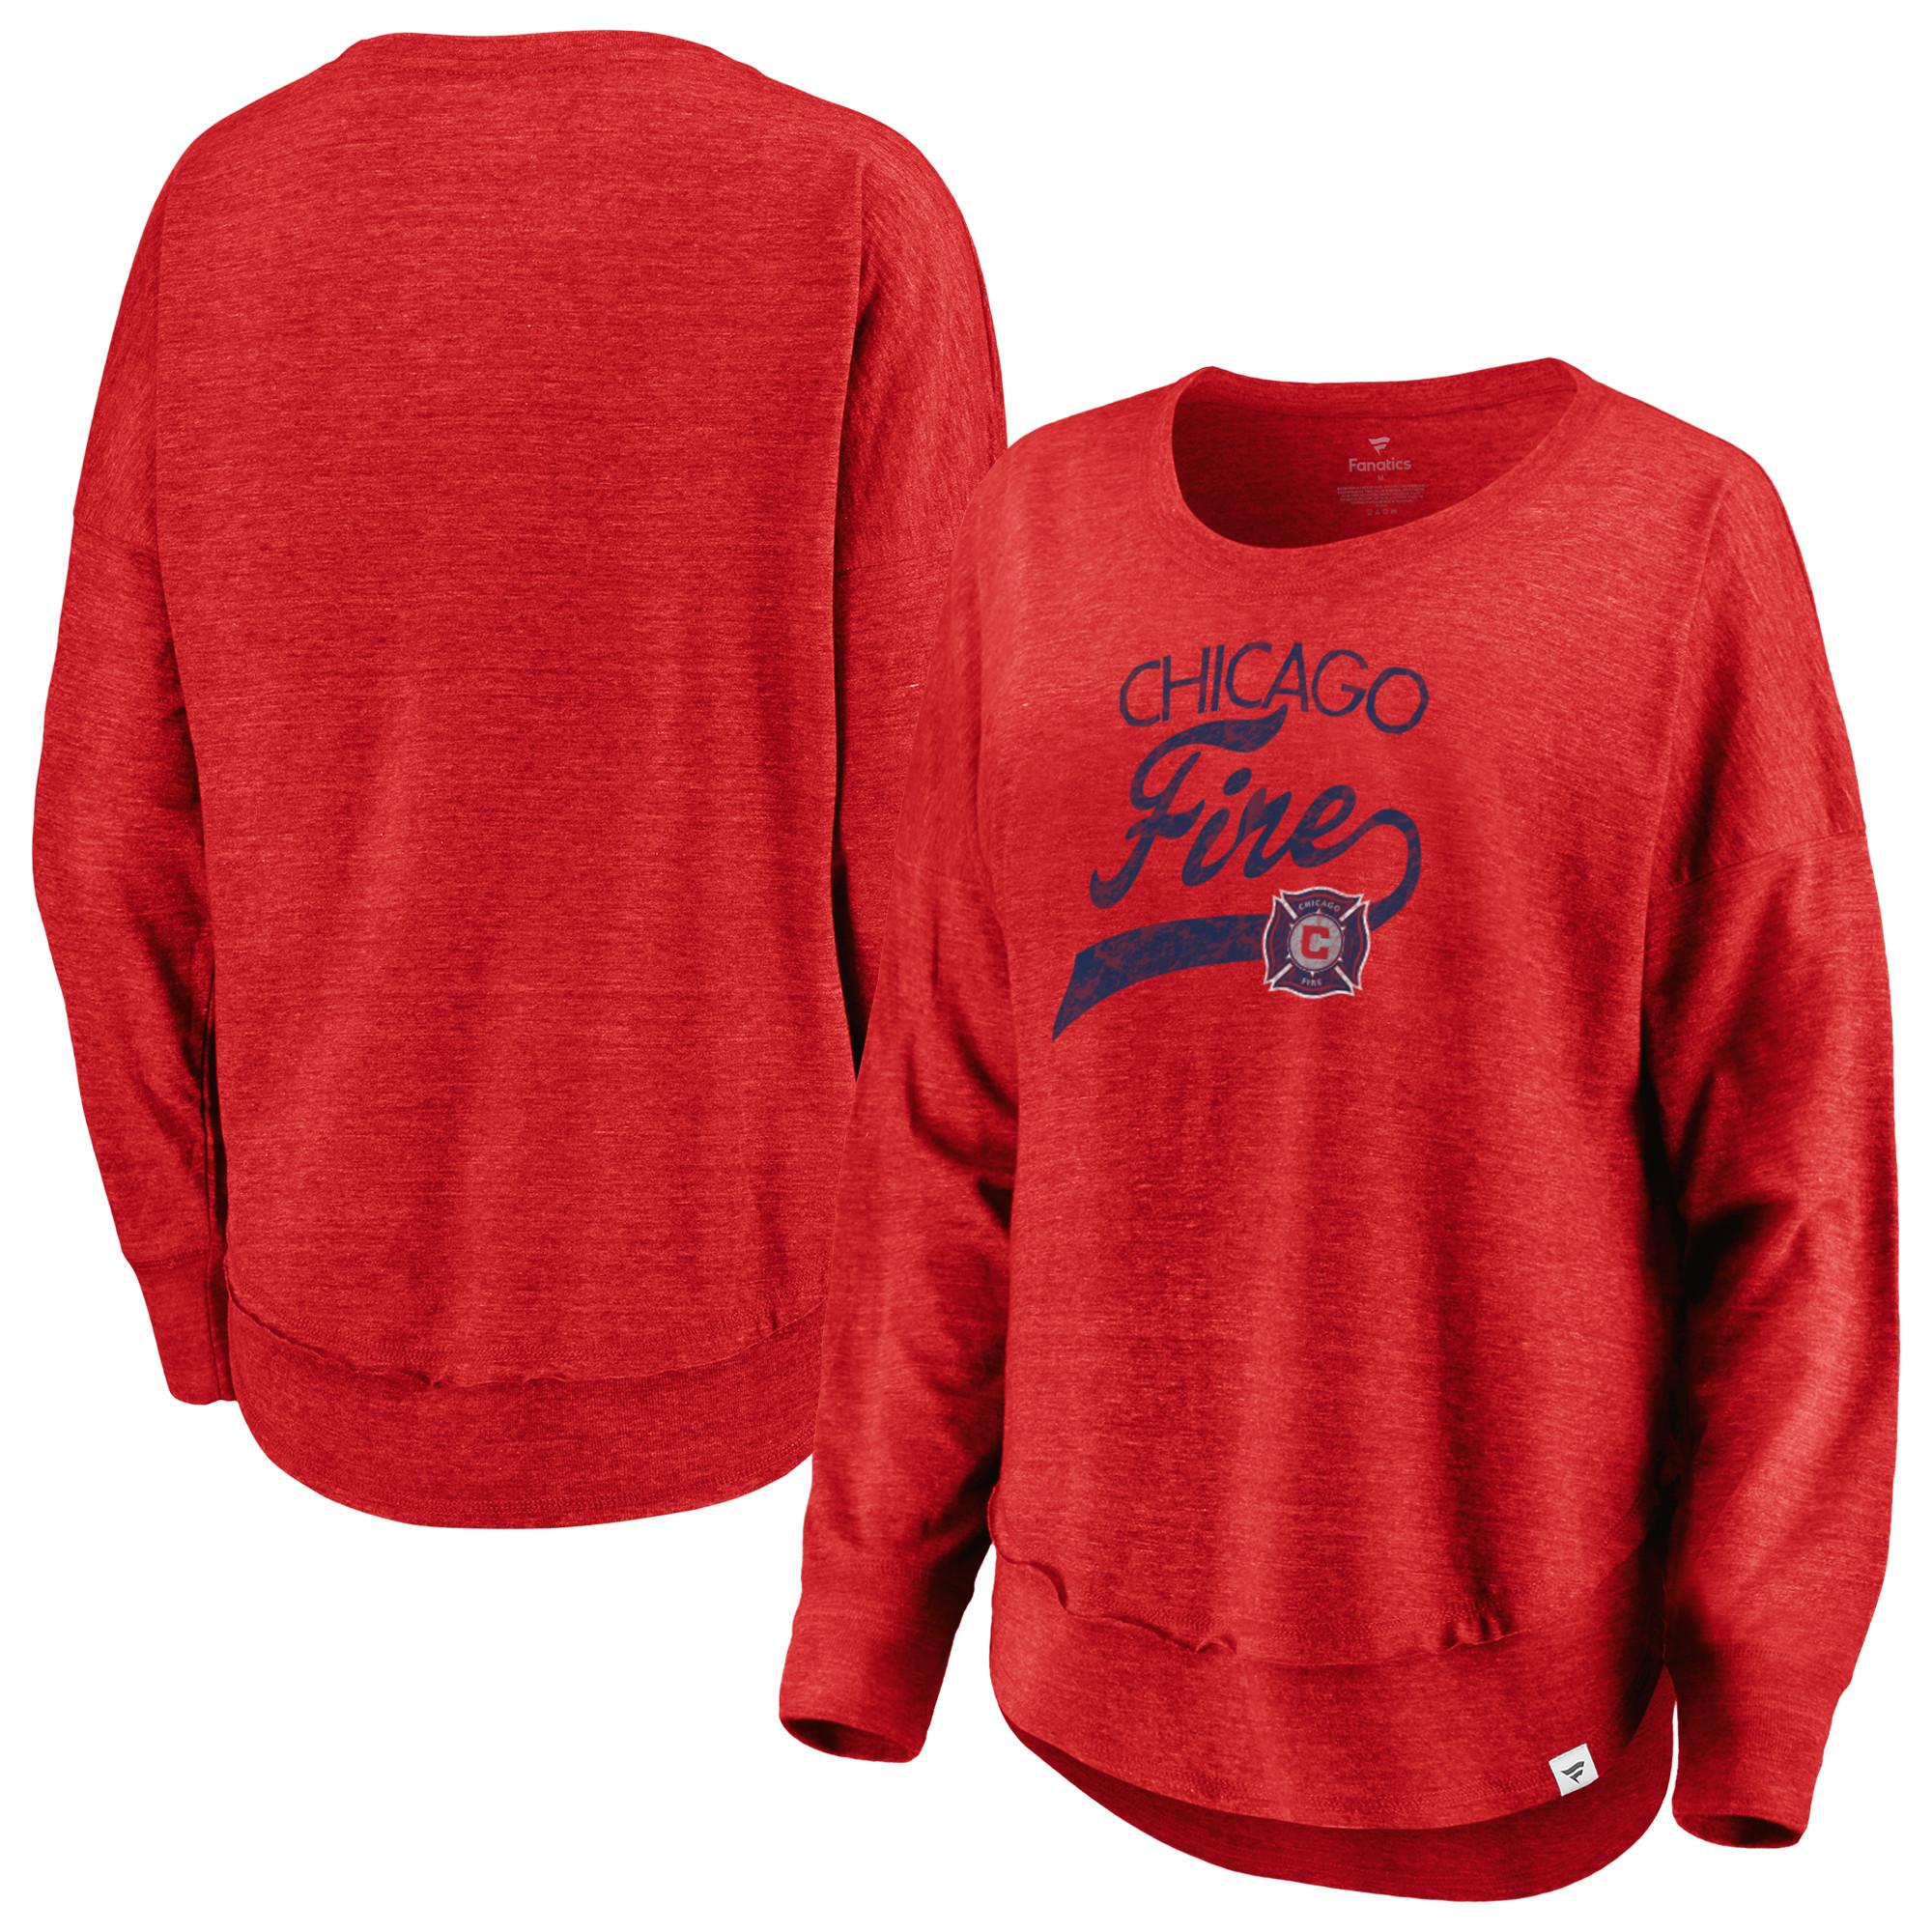 Chicago Fire Fanatics Branded Women's True Classics Amaze Long Sleeve T-Shirt - Red